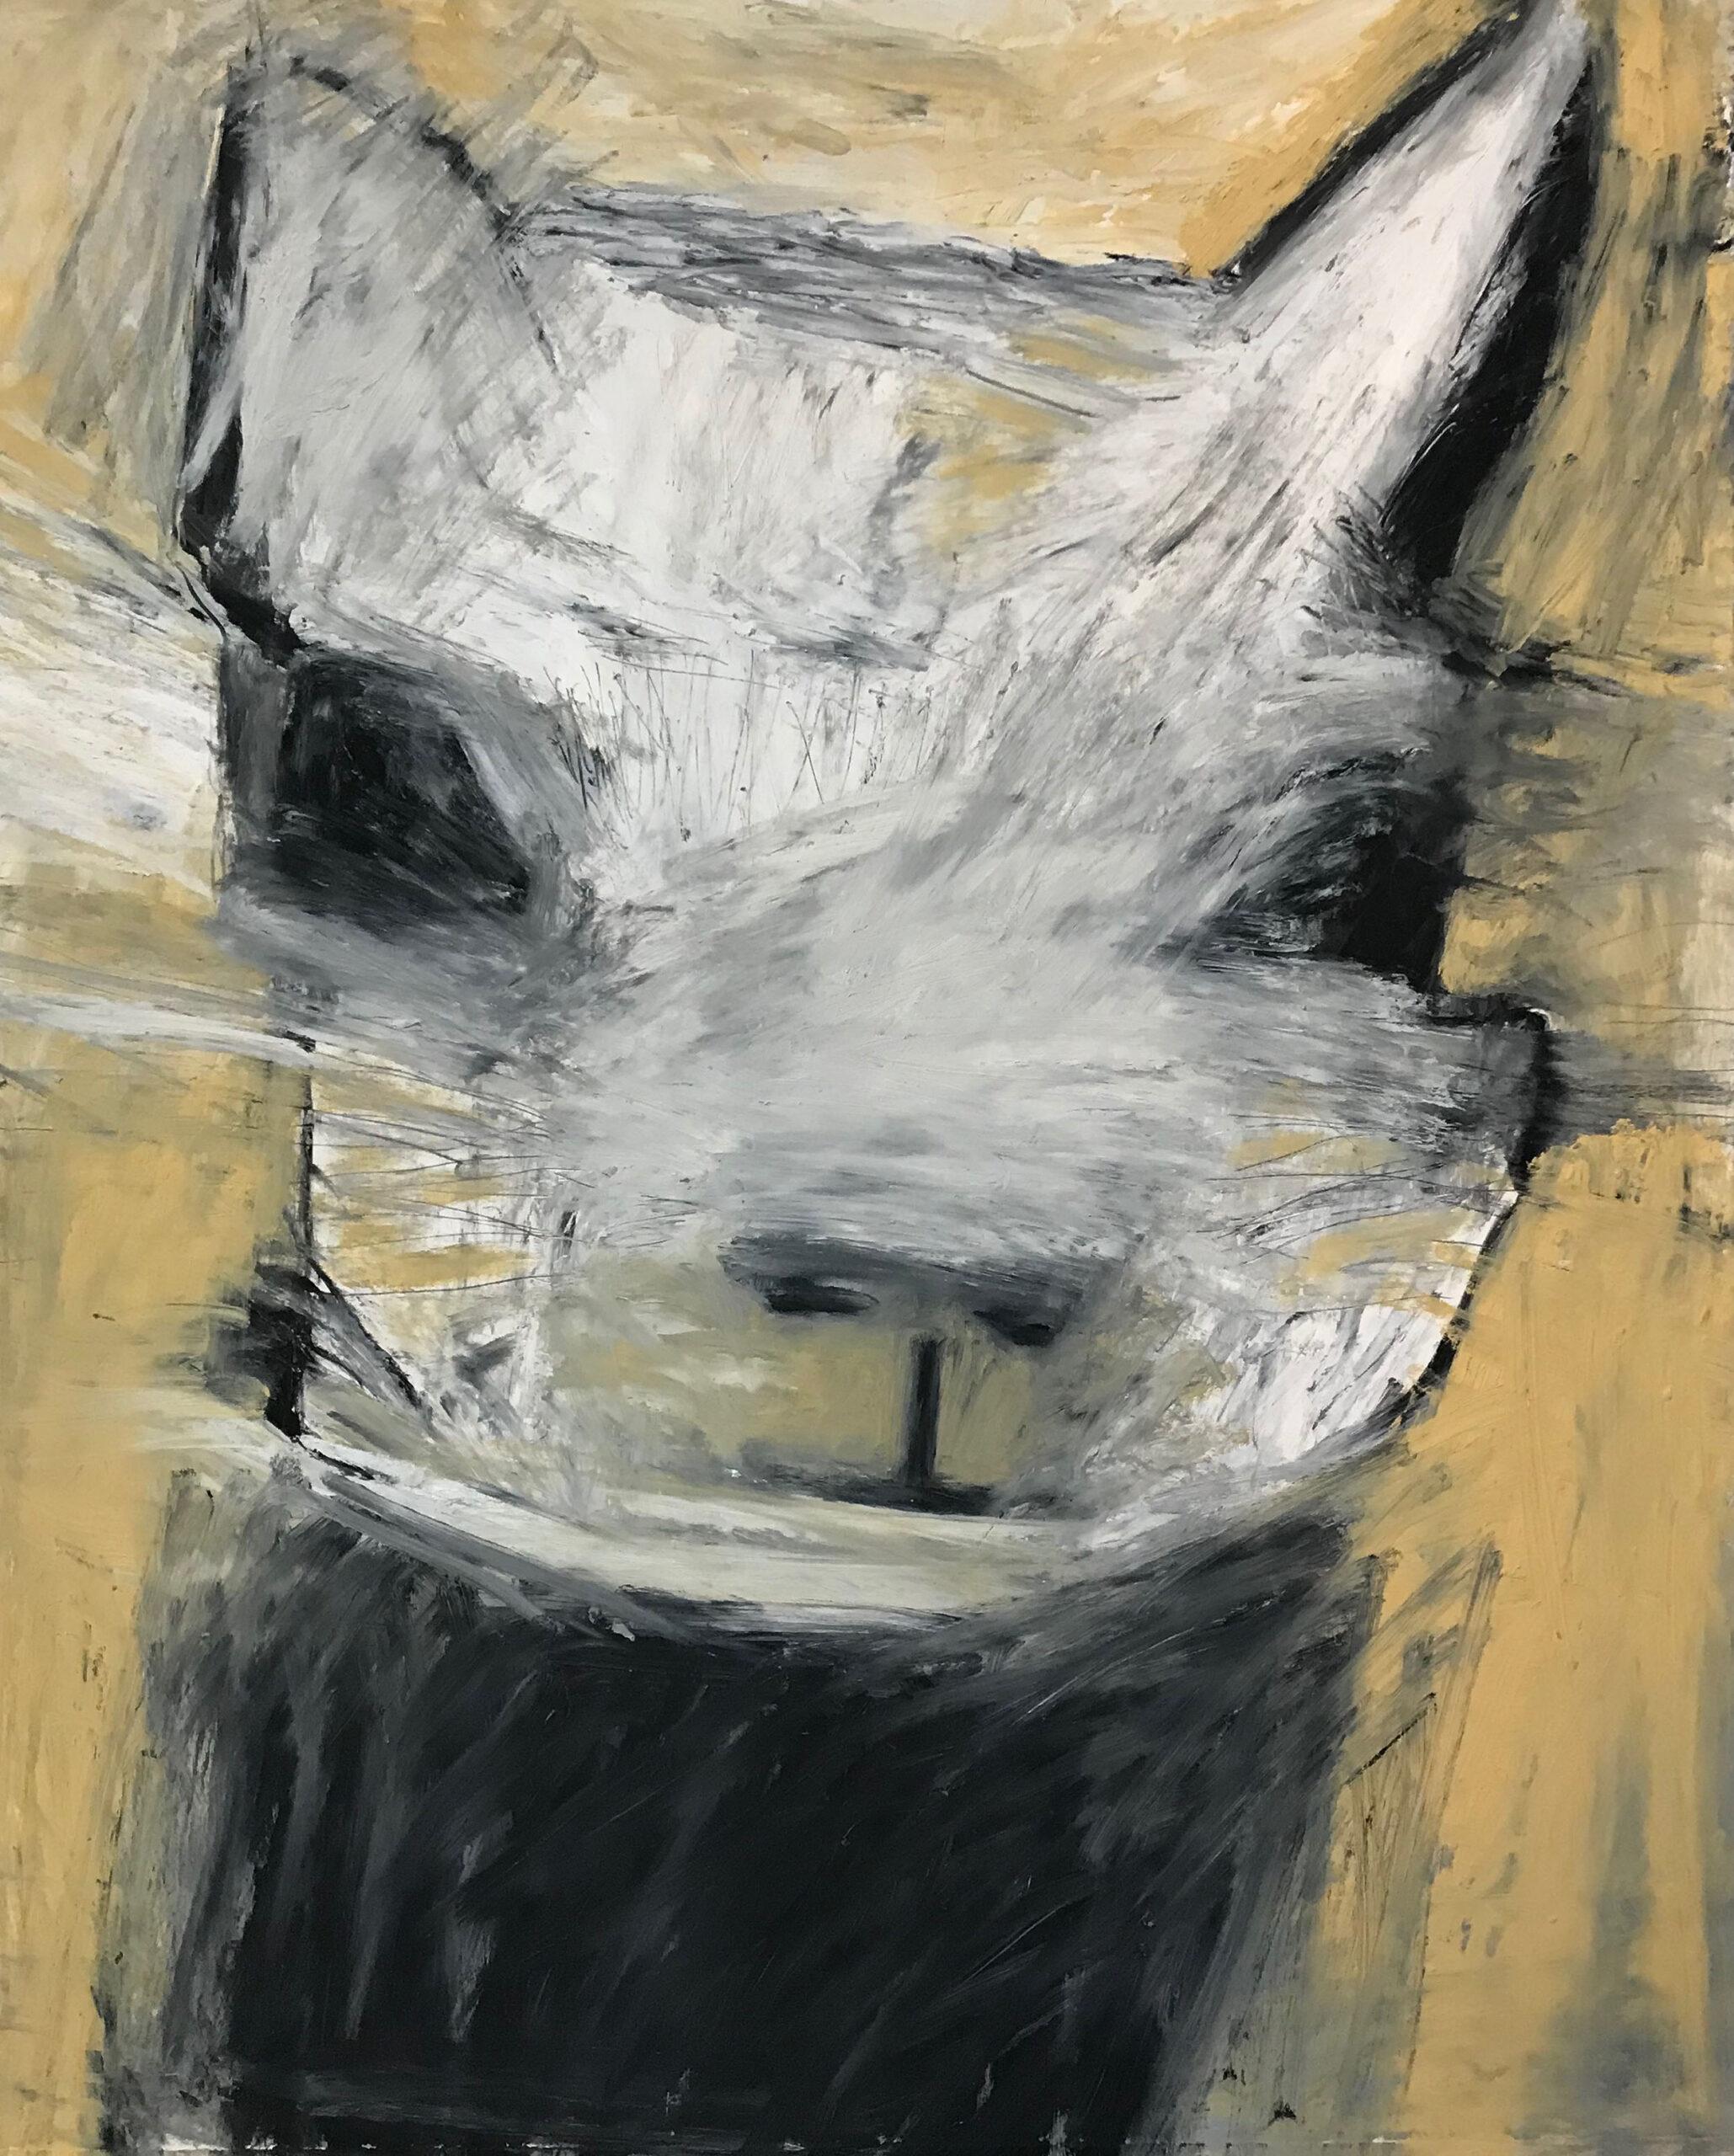 """Squirrel, Civilian Beast"" by Val Sivilli, oil stick on Arches 88, 30 x 22"